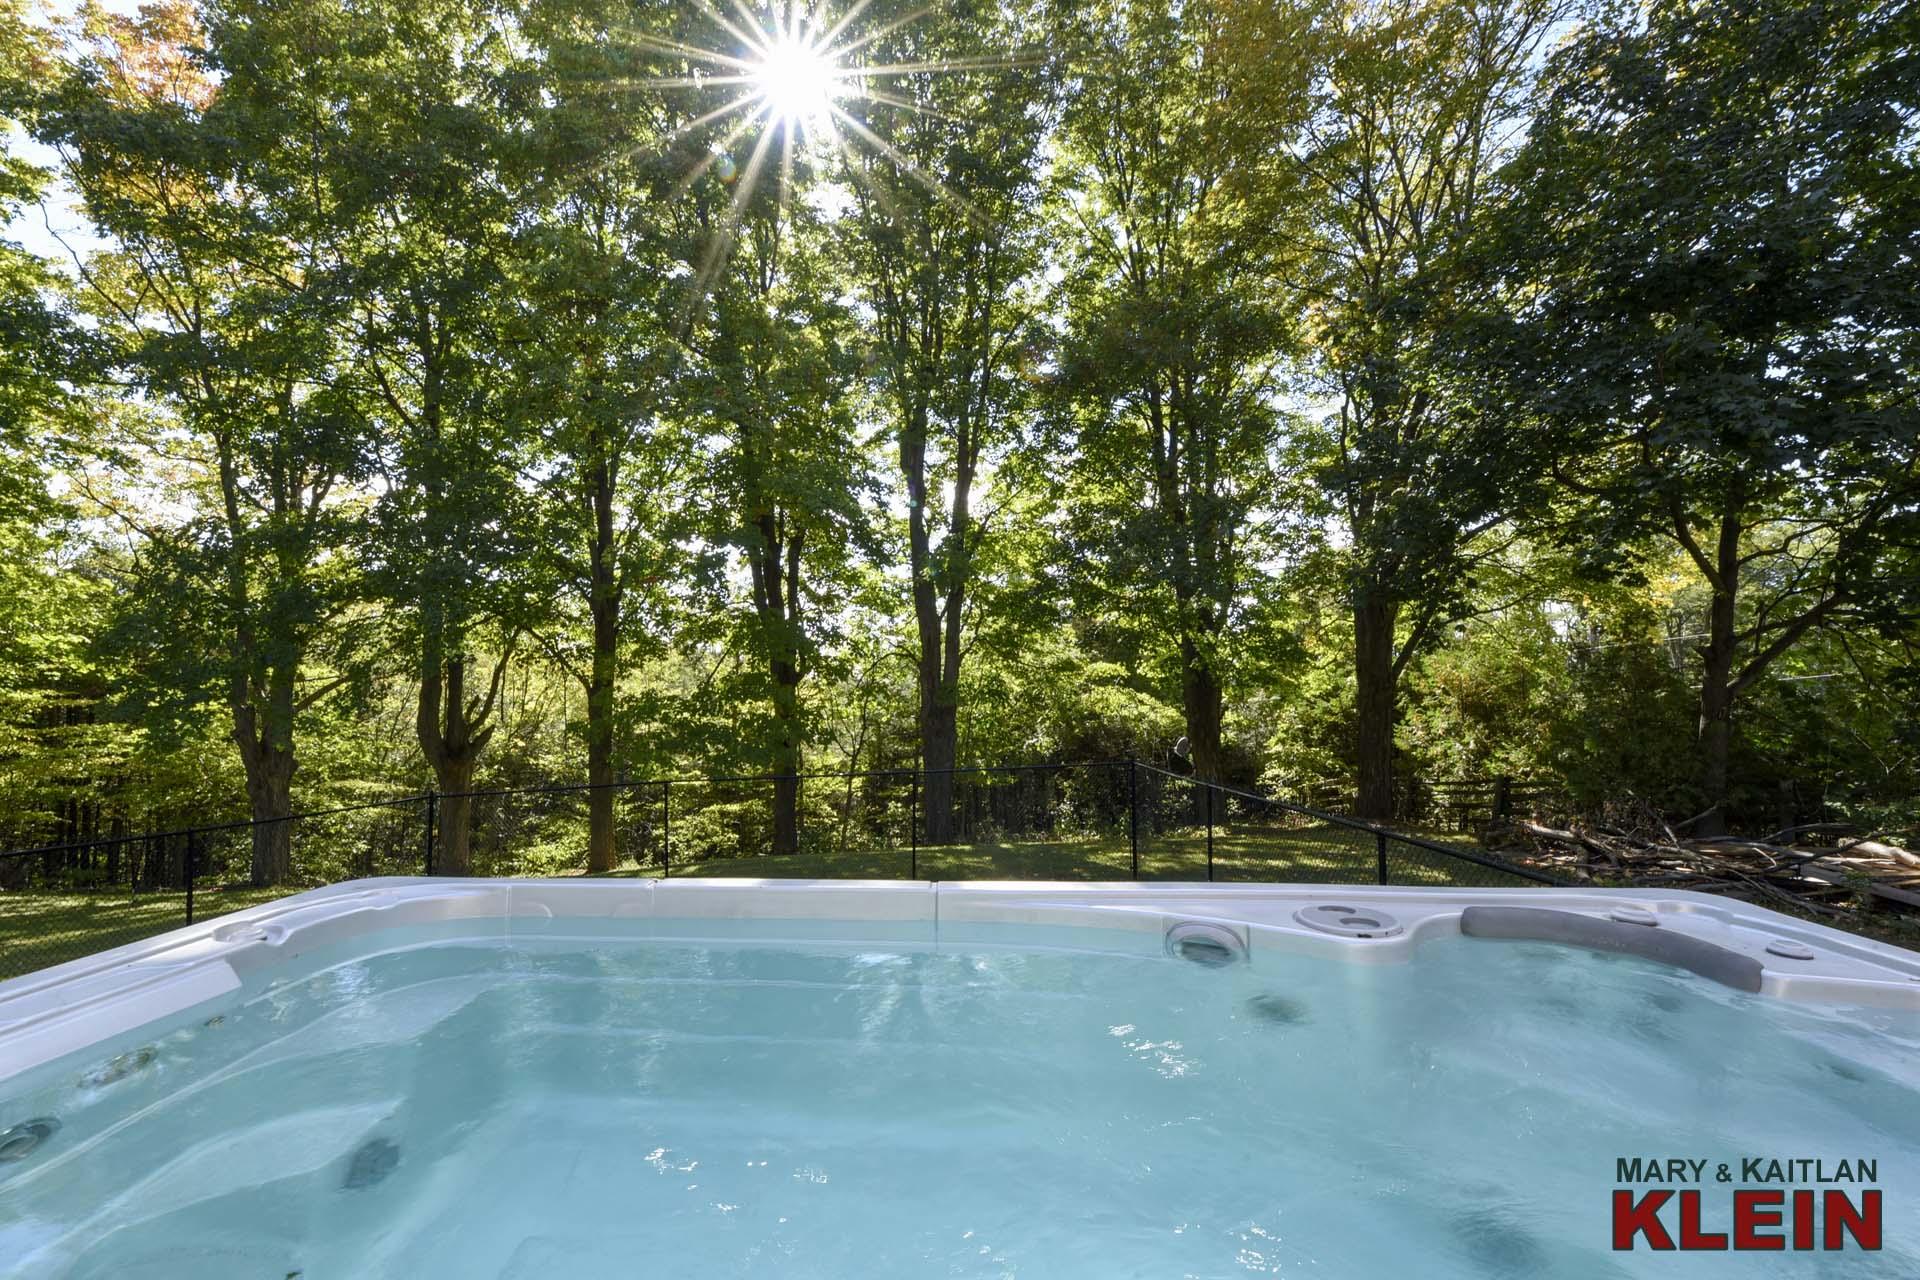 Hydro pool swim spa